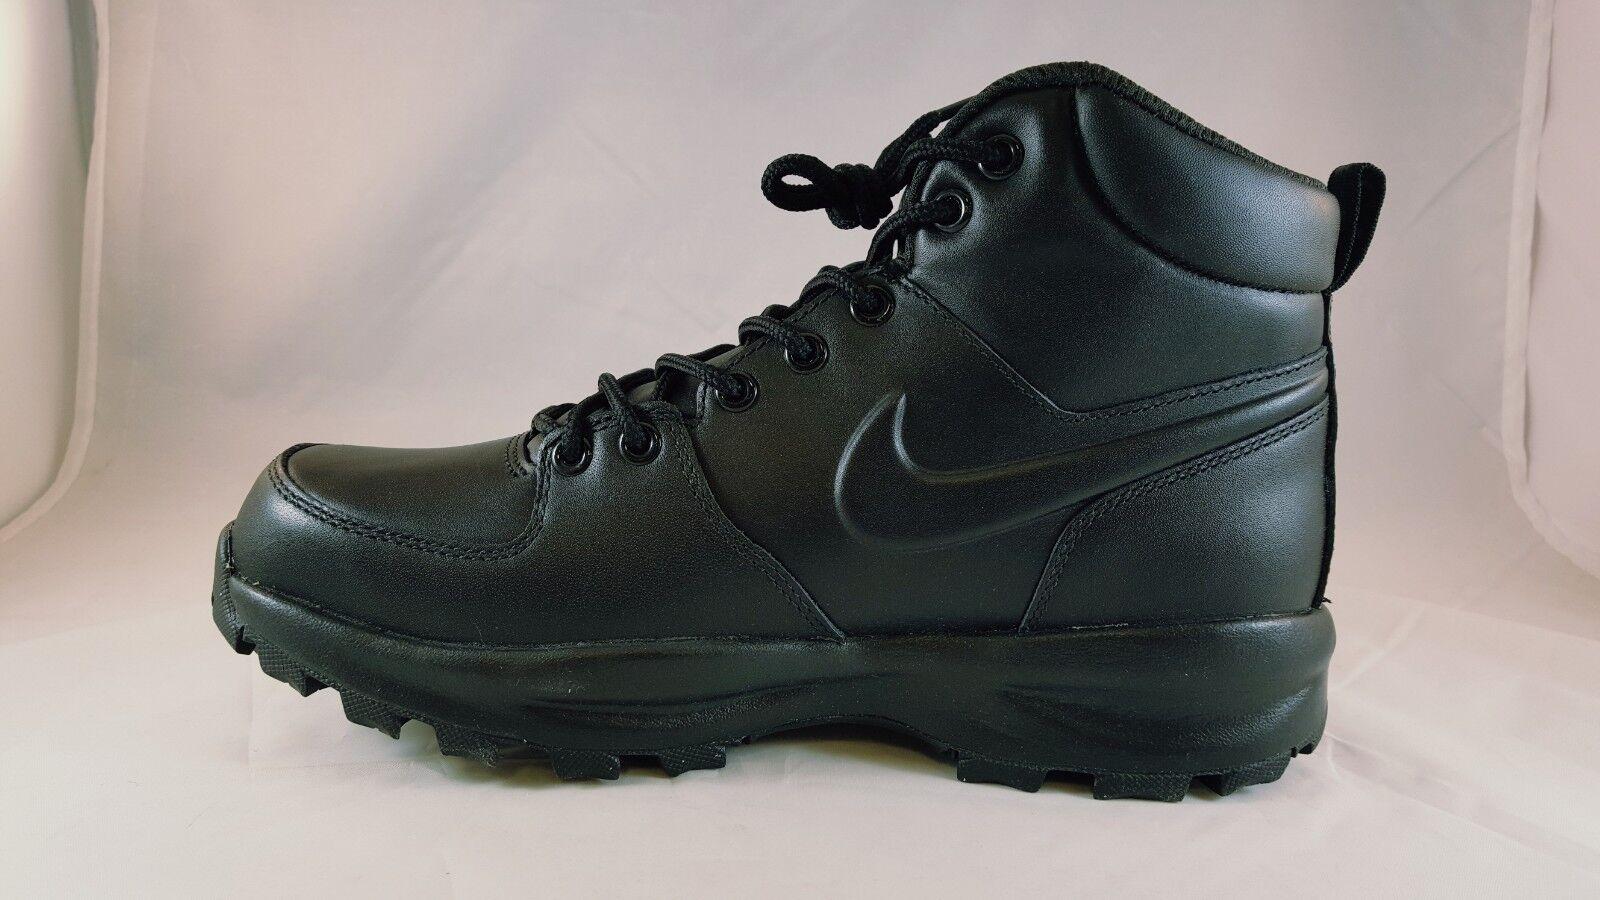 best cheap 9c62d 7b9a0 Nike Manoa Leather Men s Men s Men s Hiking Boot 454350 003 Size 8 74e8a3